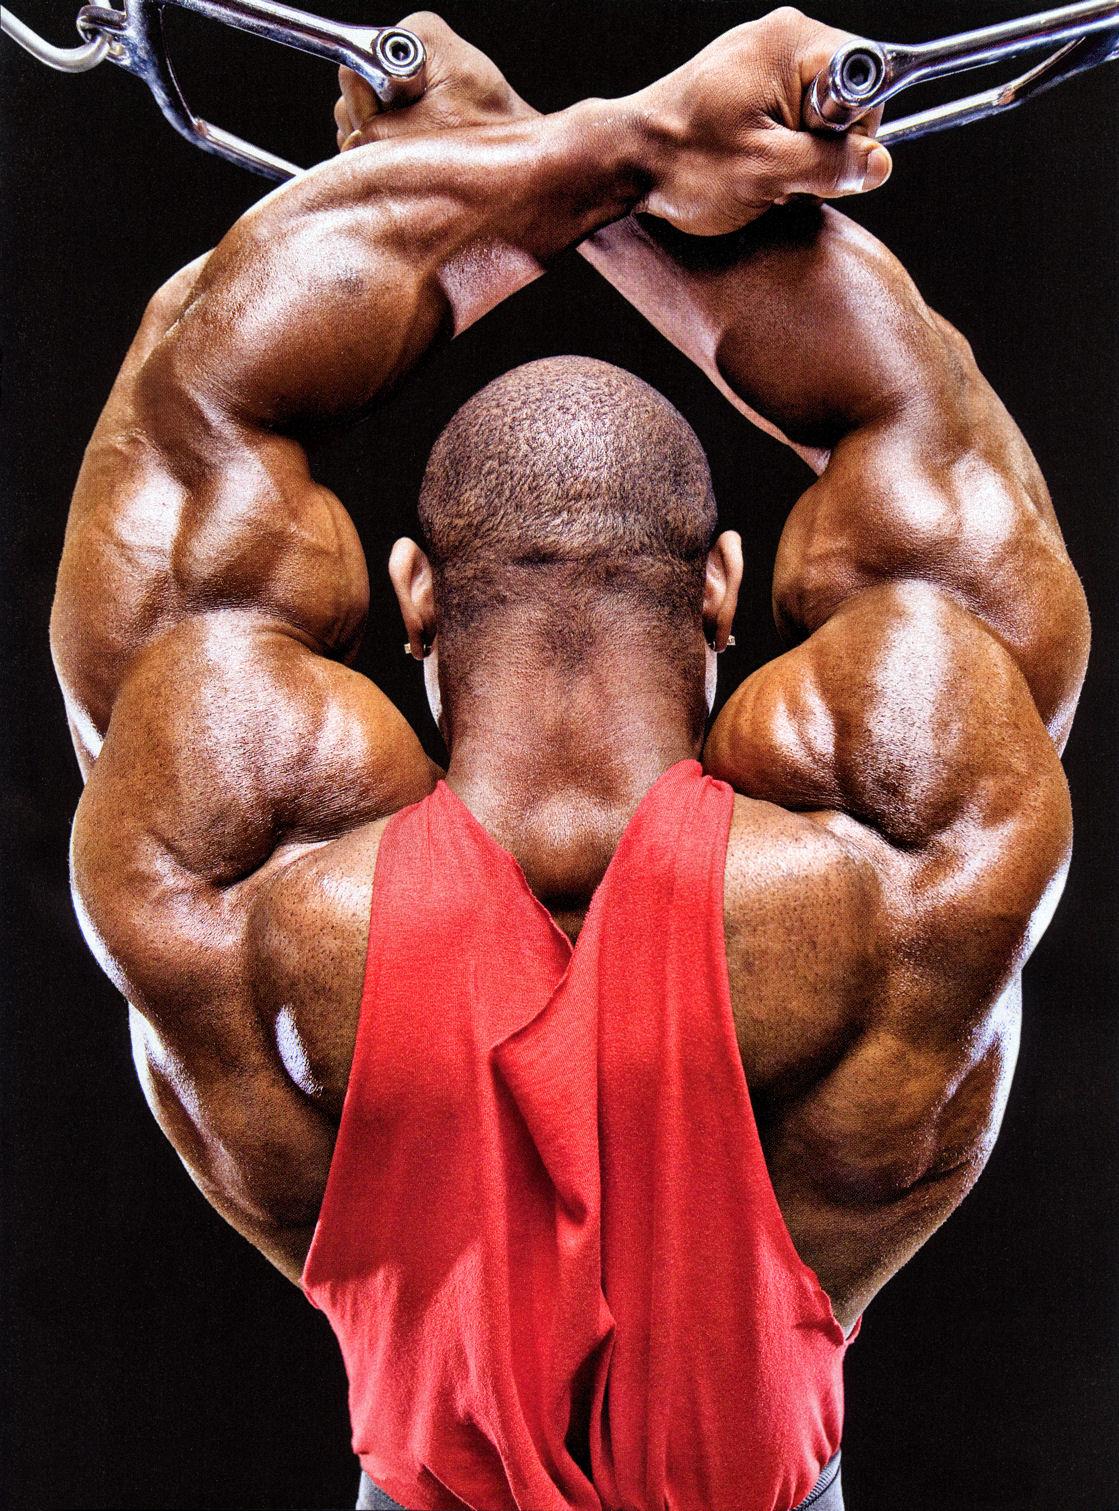 Dexter Jackson - IFBB professional bodybuilder | Fitness